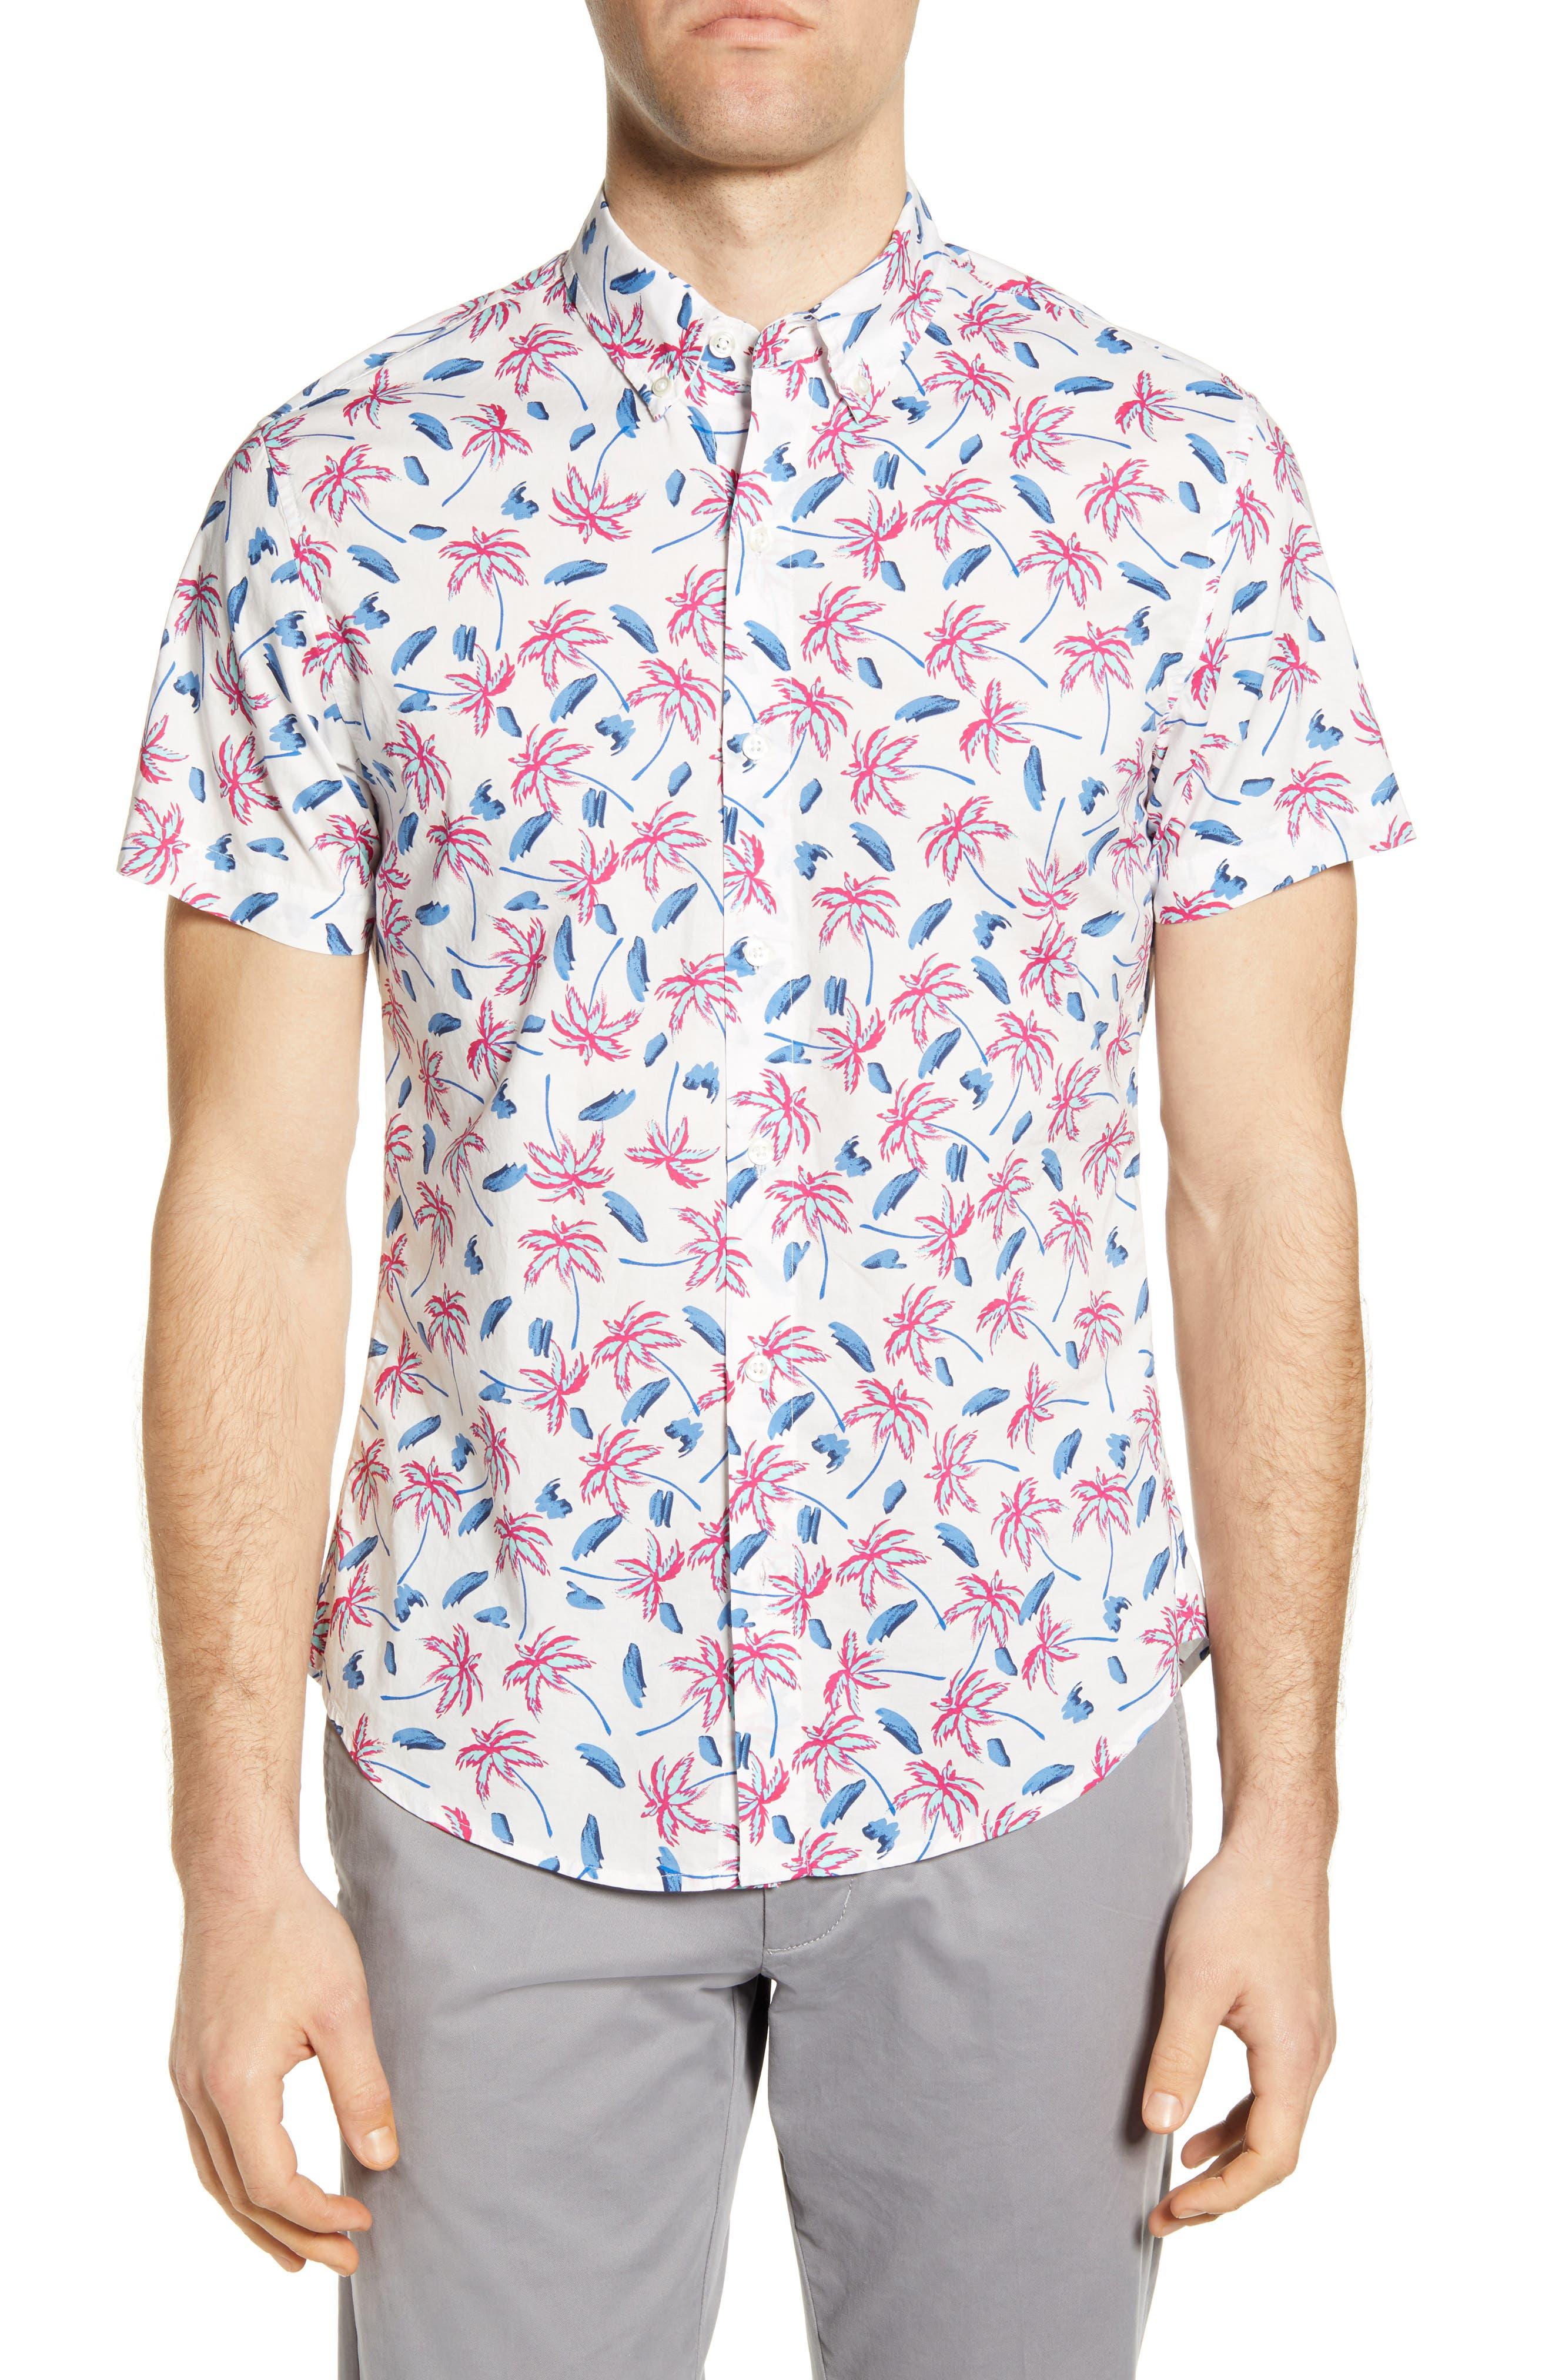 Riviera Slim Fit Tropical Short Sleeve Button-Down Shirt